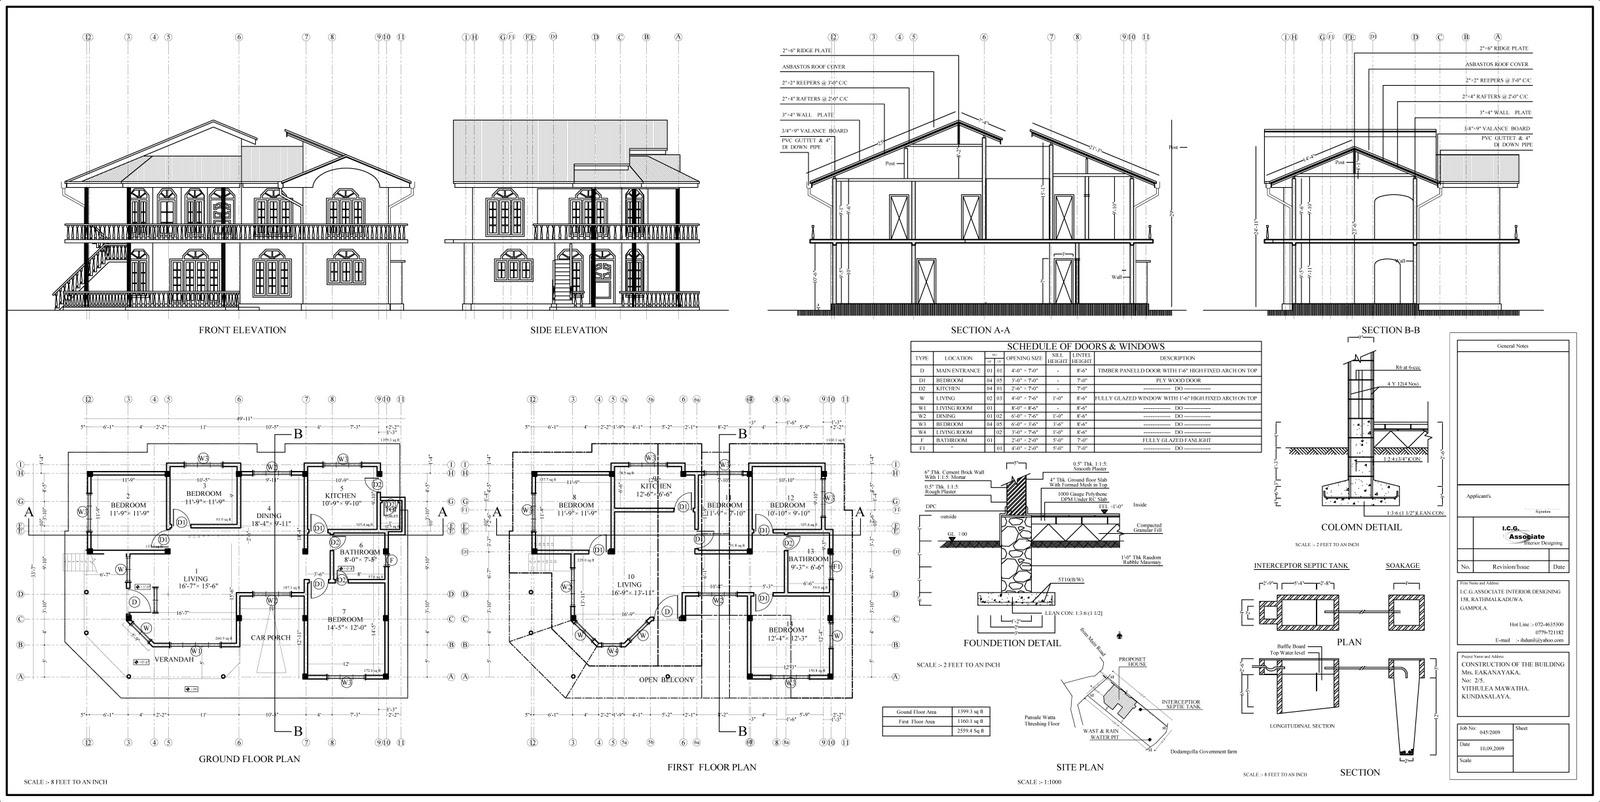 House Plans In Sri Lanka With Photos - Modern House